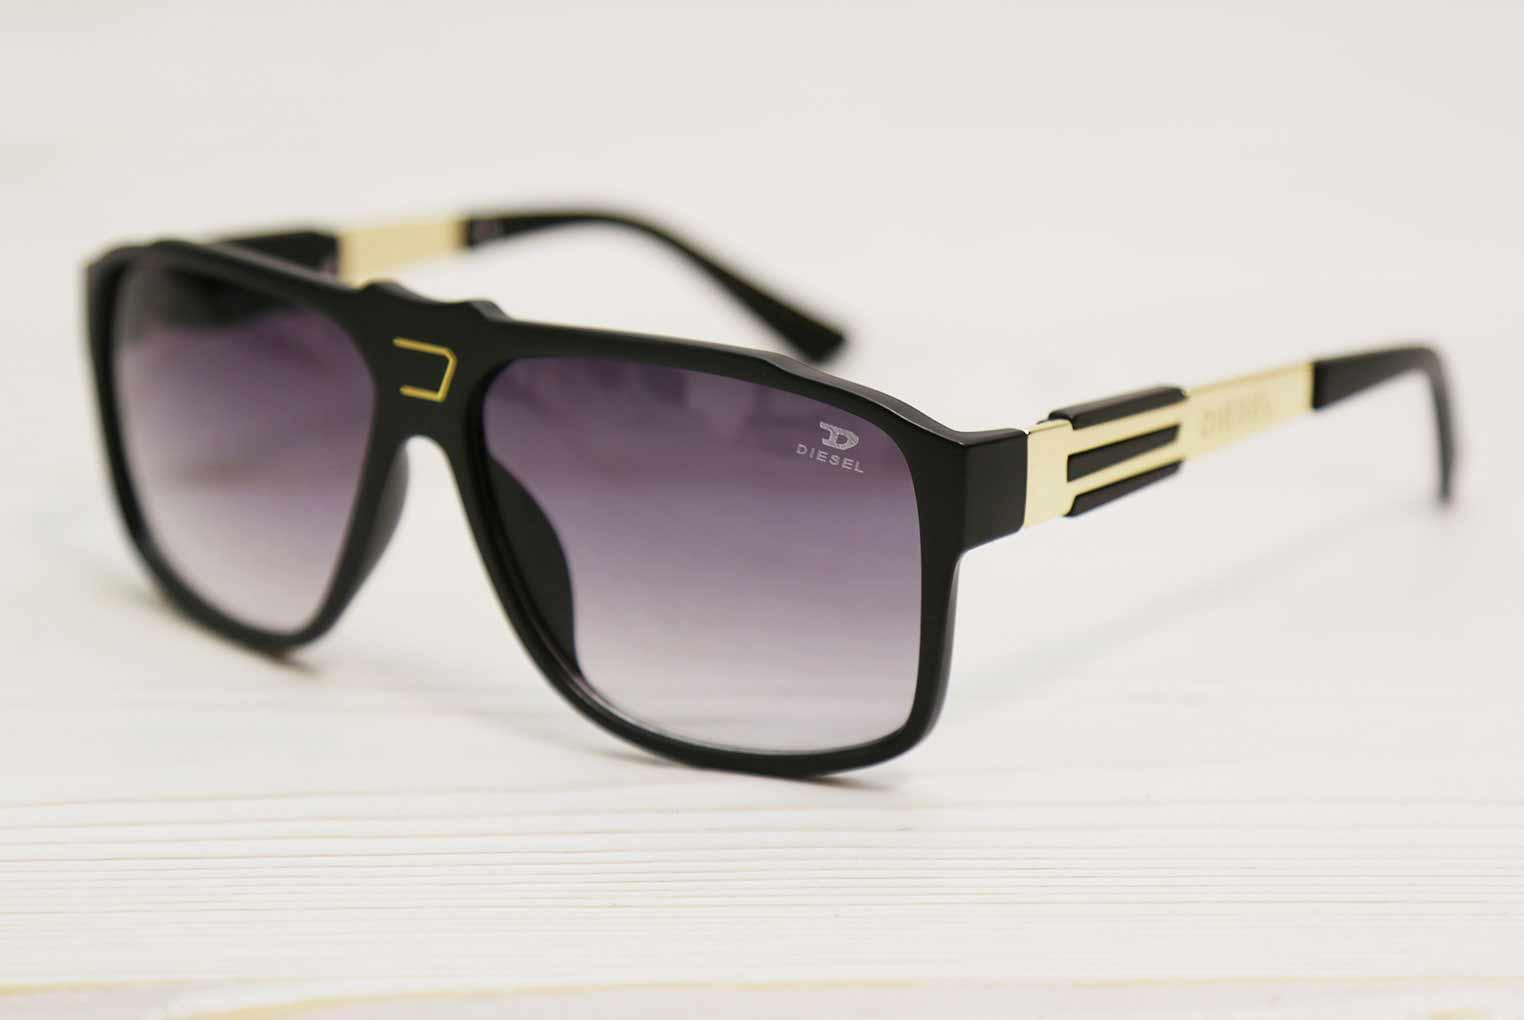 عینک مردانه دیزل 3 تری لاین